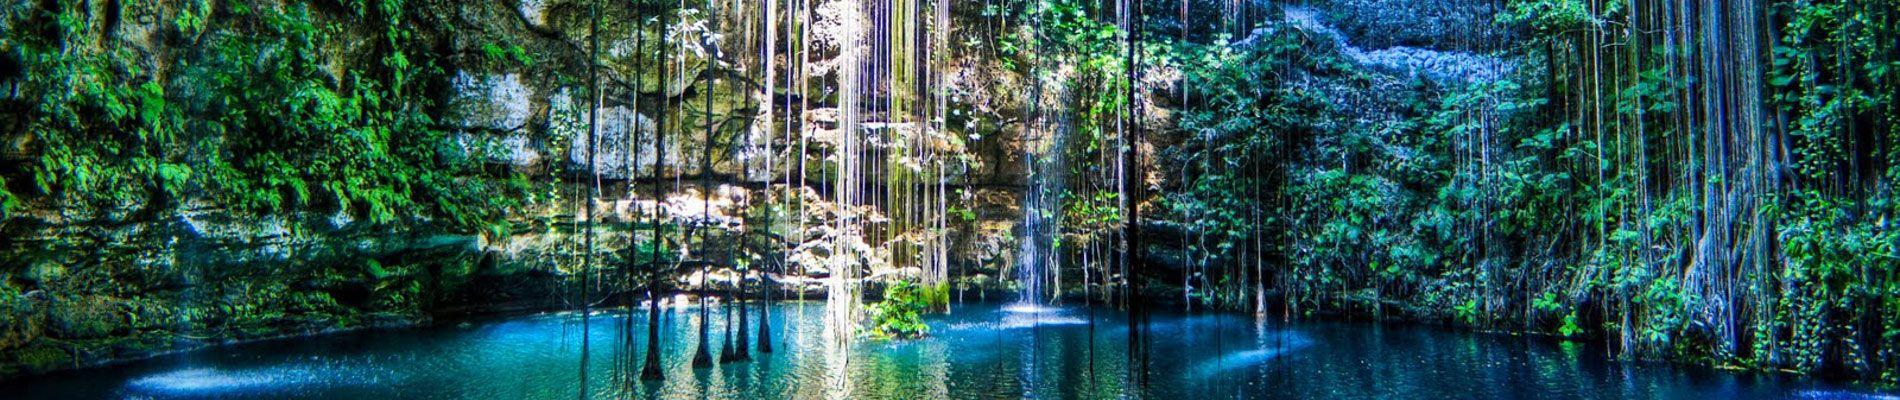 mexique-yucatan-cenote-ik-kil